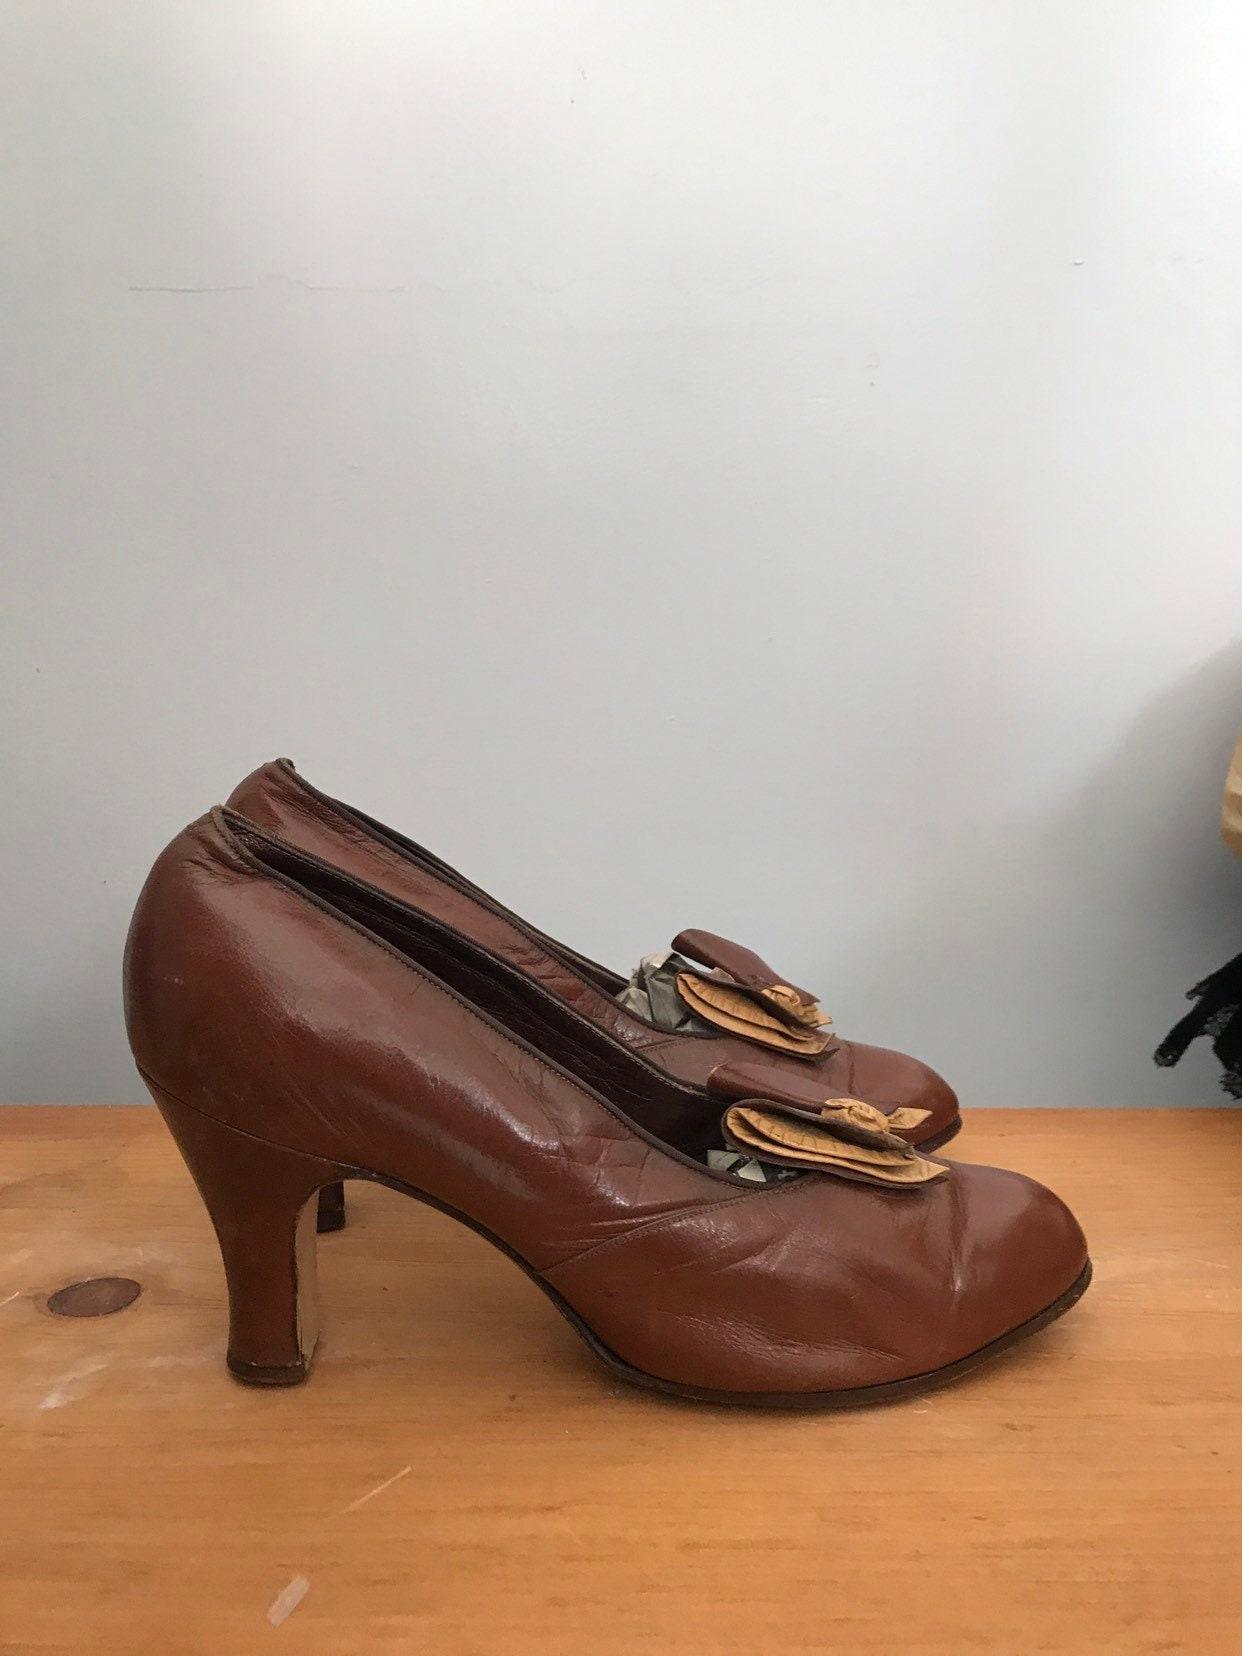 Deco Leather 30s Pumps Bow Era Chocolate Brown Depression EYWHDe29Ib